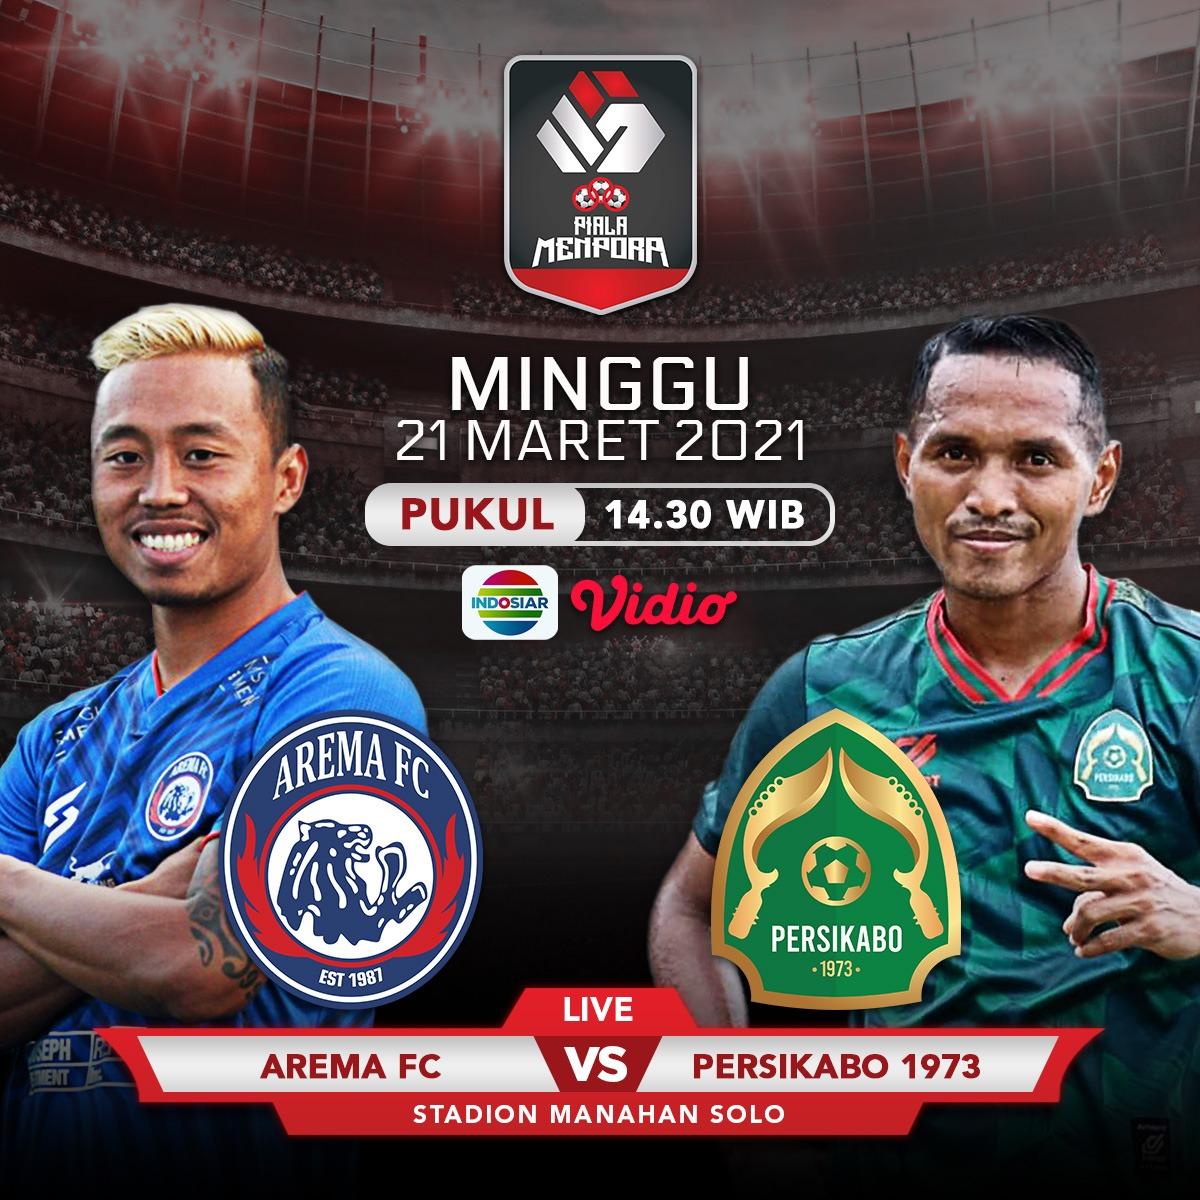 Sedang berlangsung Arema FC vs Tira-Persikabo